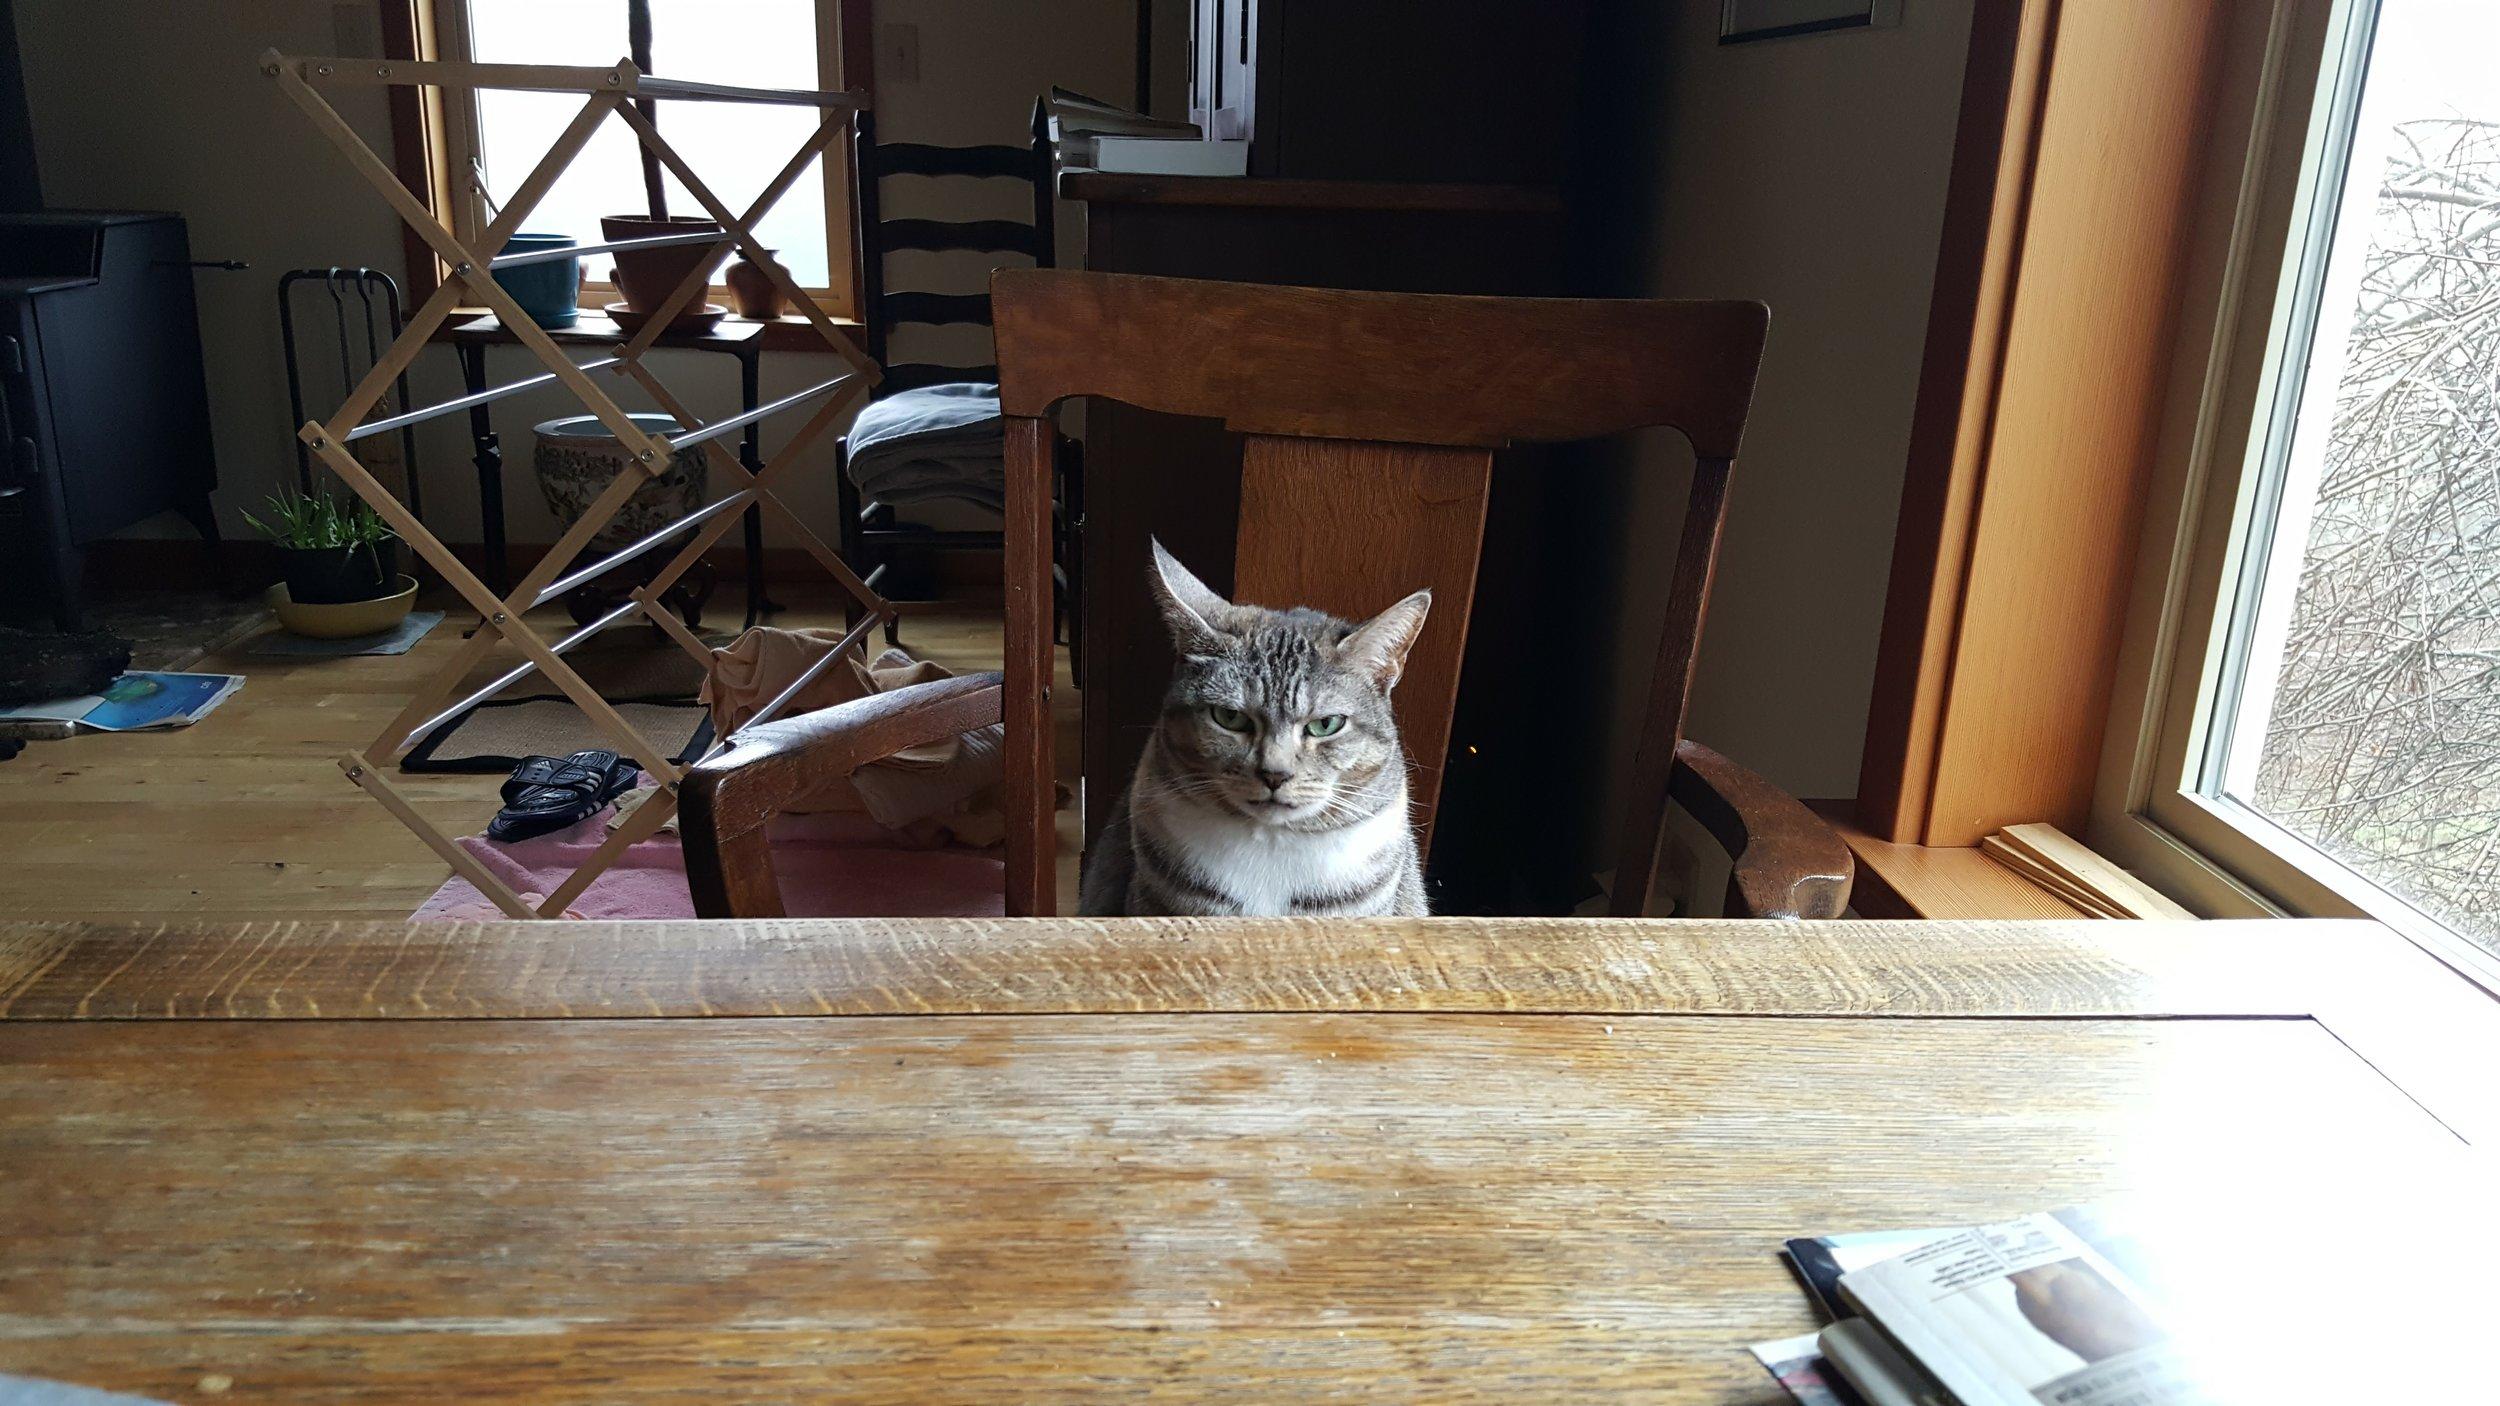 My daily breakfast companion